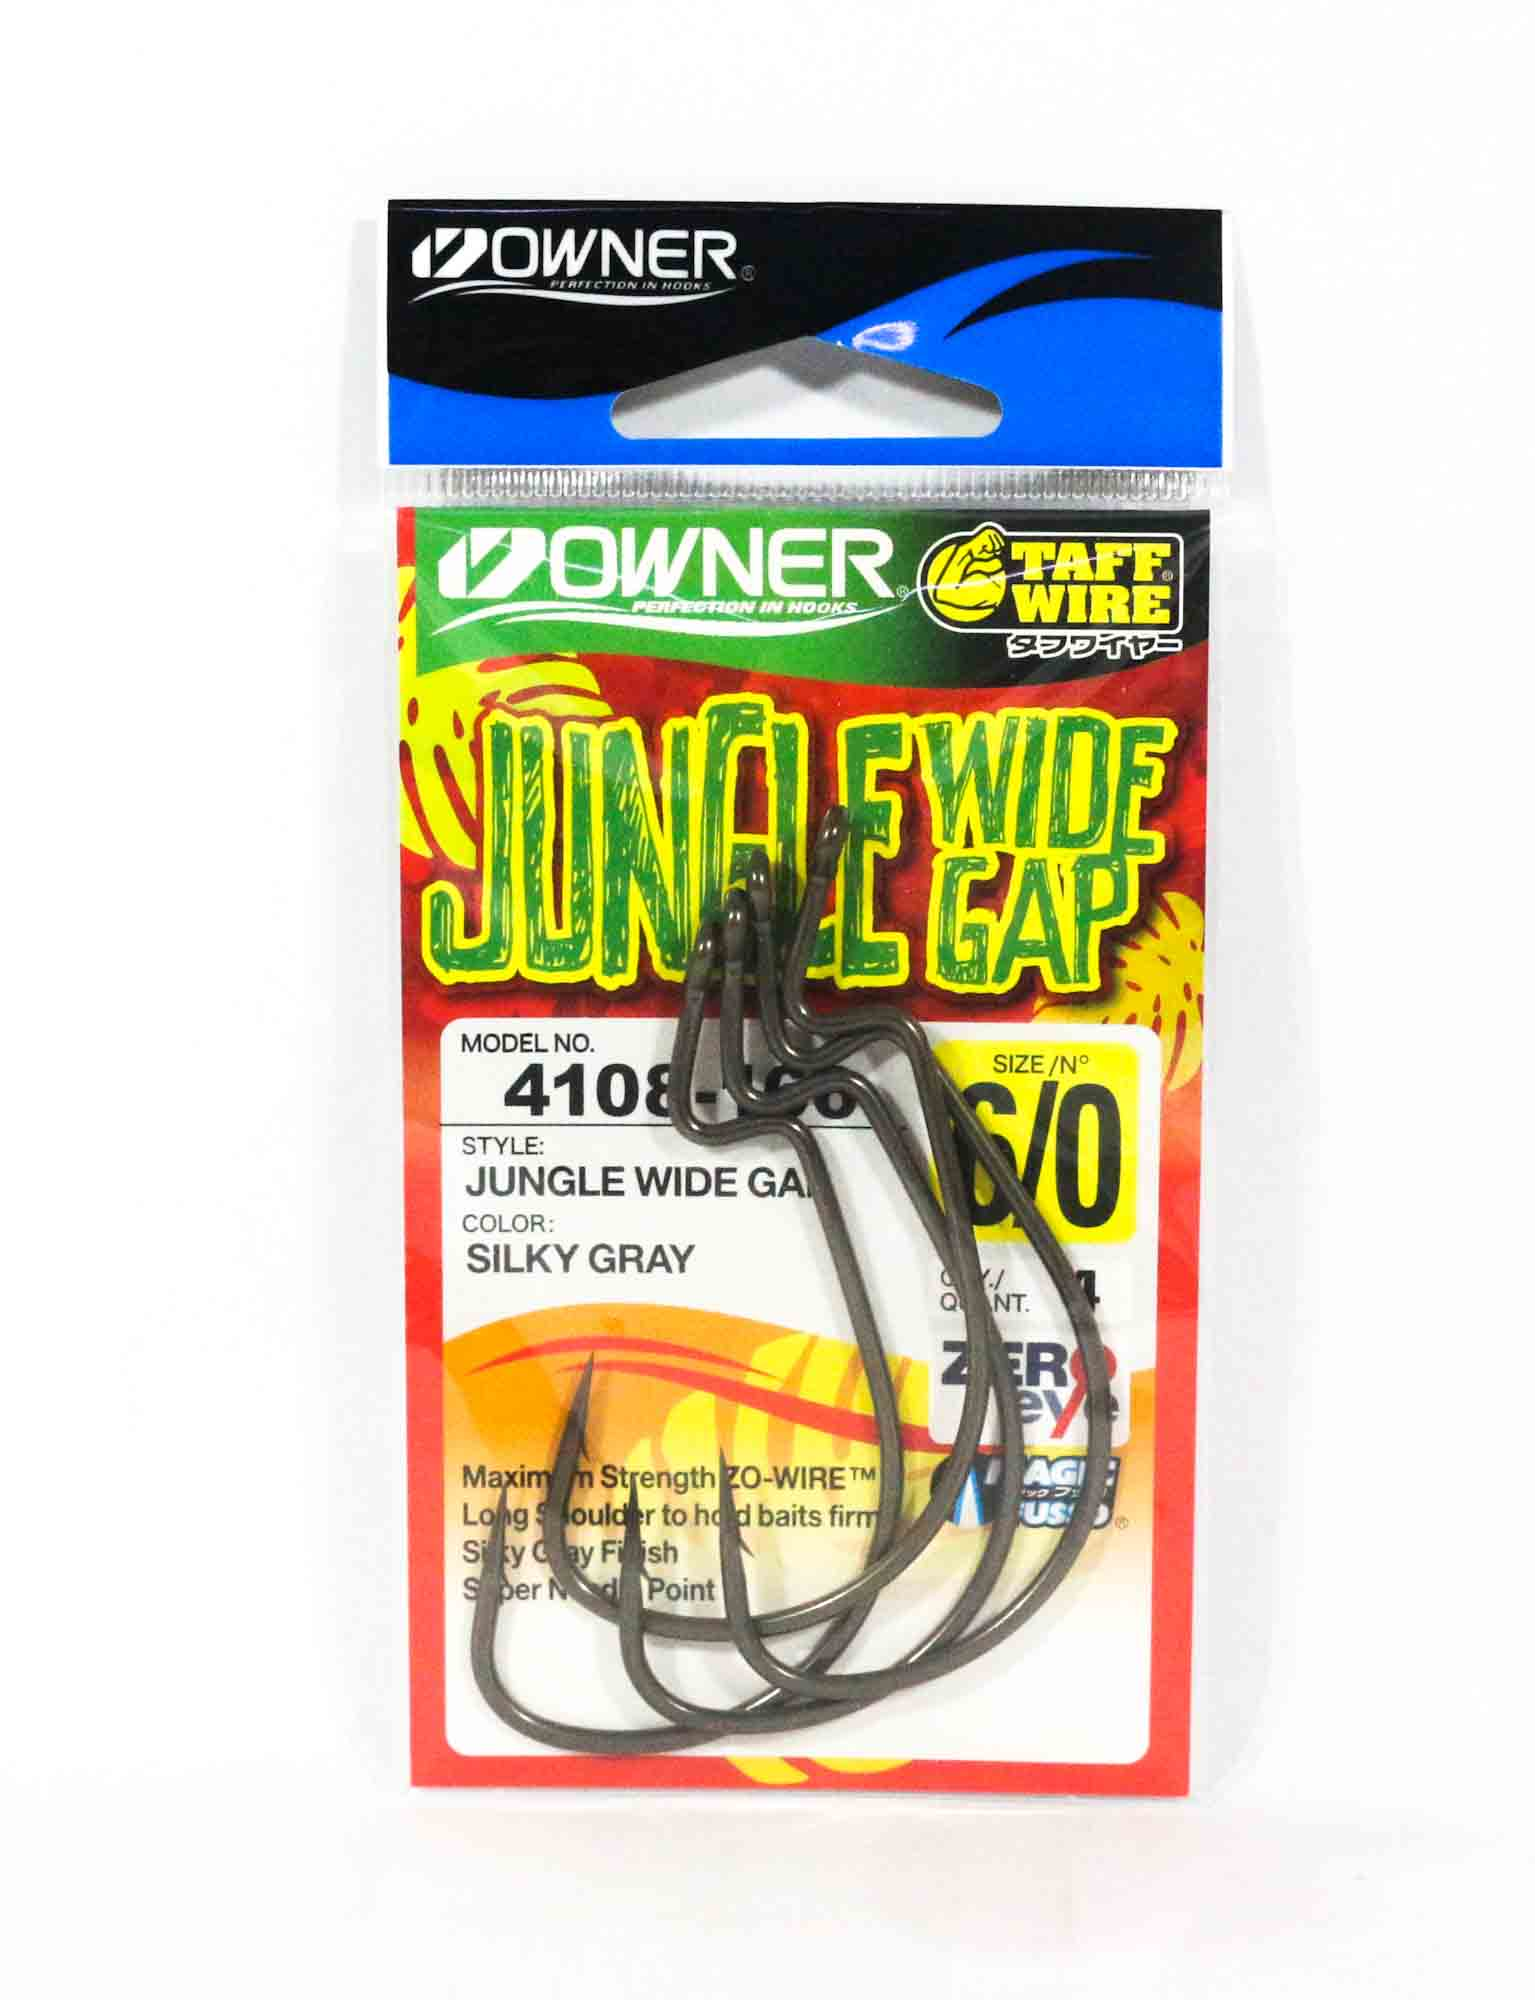 Owner 54108 Jungle Wide Gap Worm Hook Size 6/0 (8091)